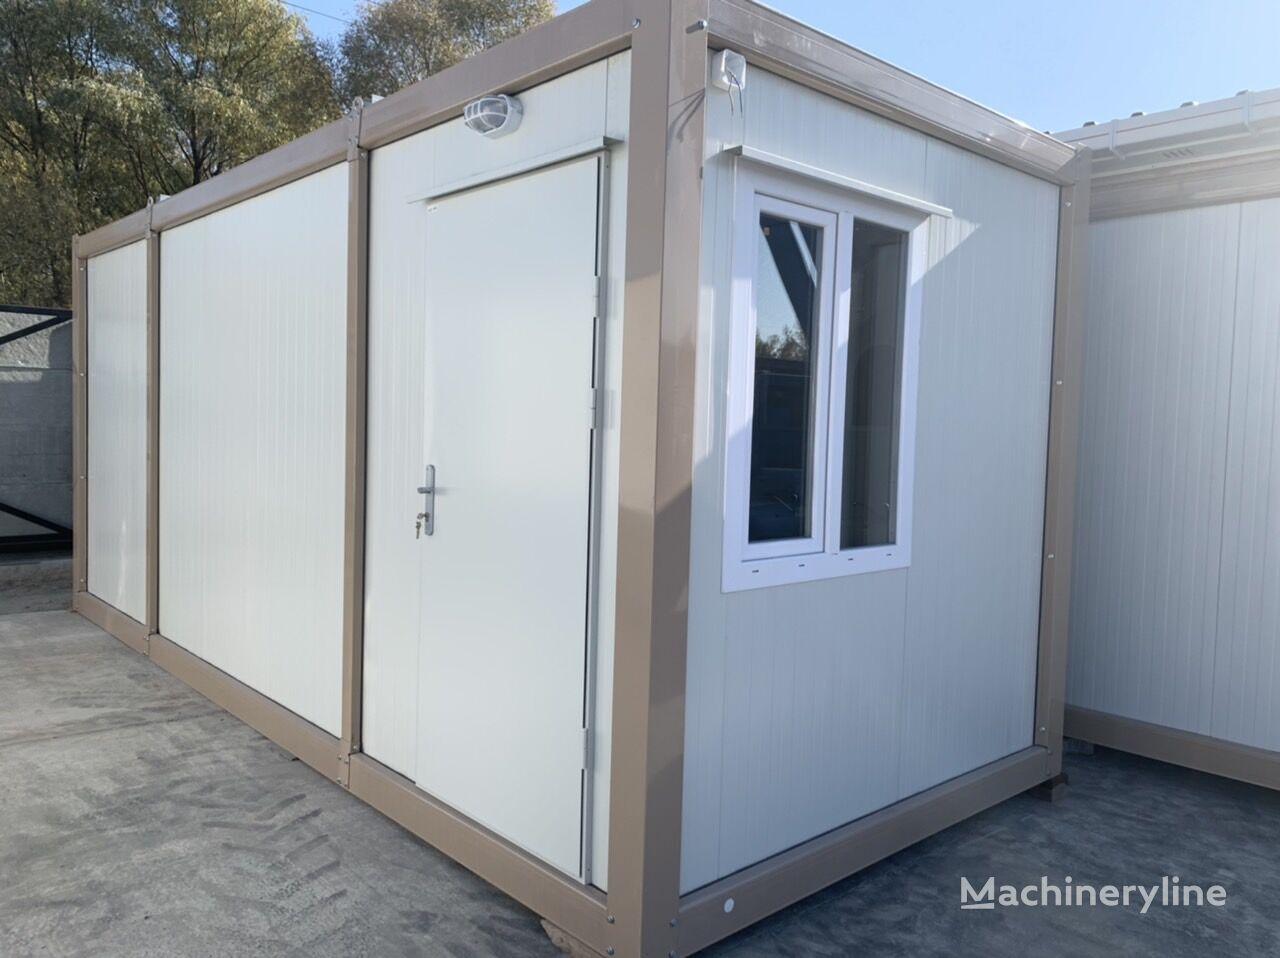 new Karmod K 1001 sanitary container